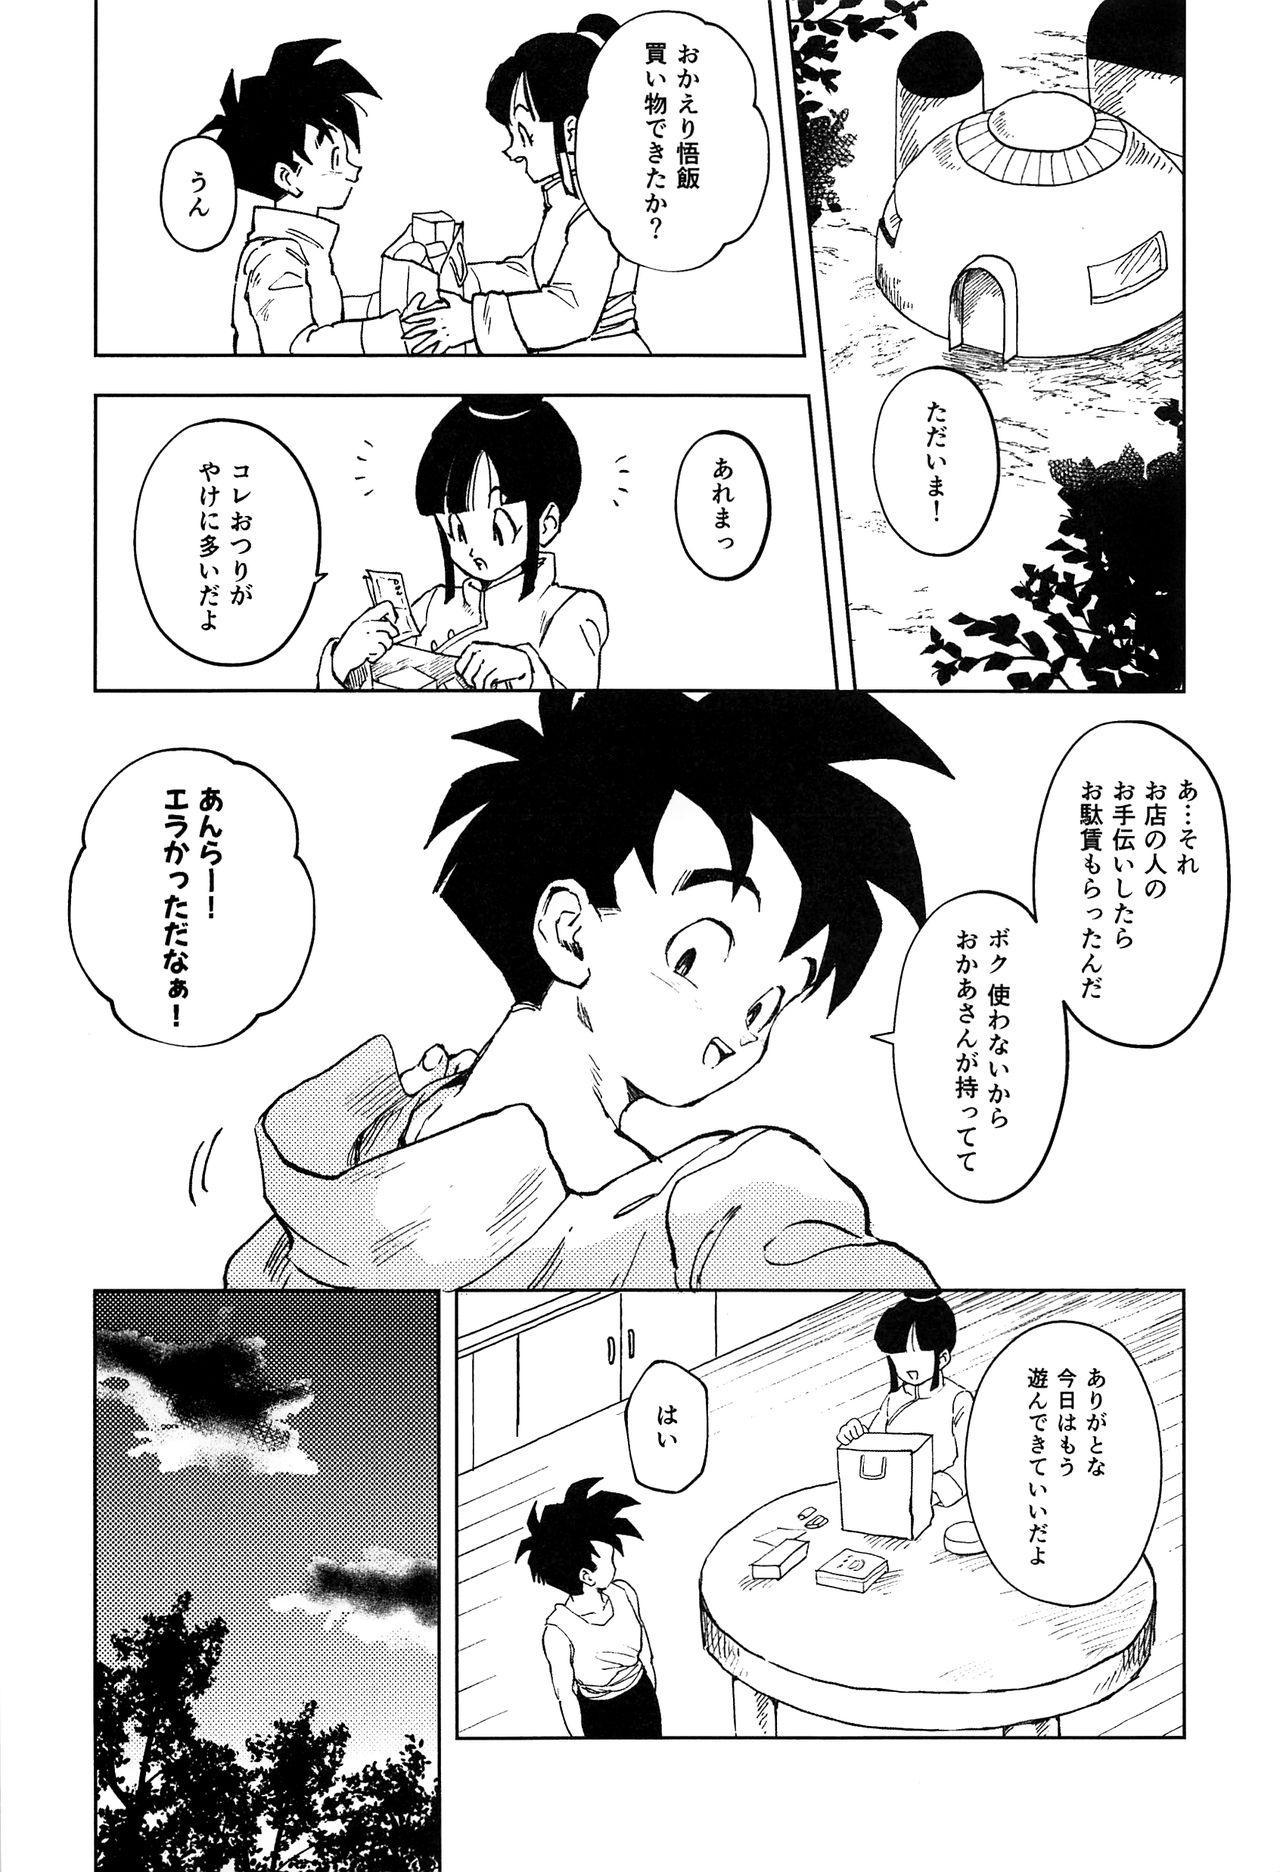 Odorokubeki Zanzou - WONDER BLUR 4